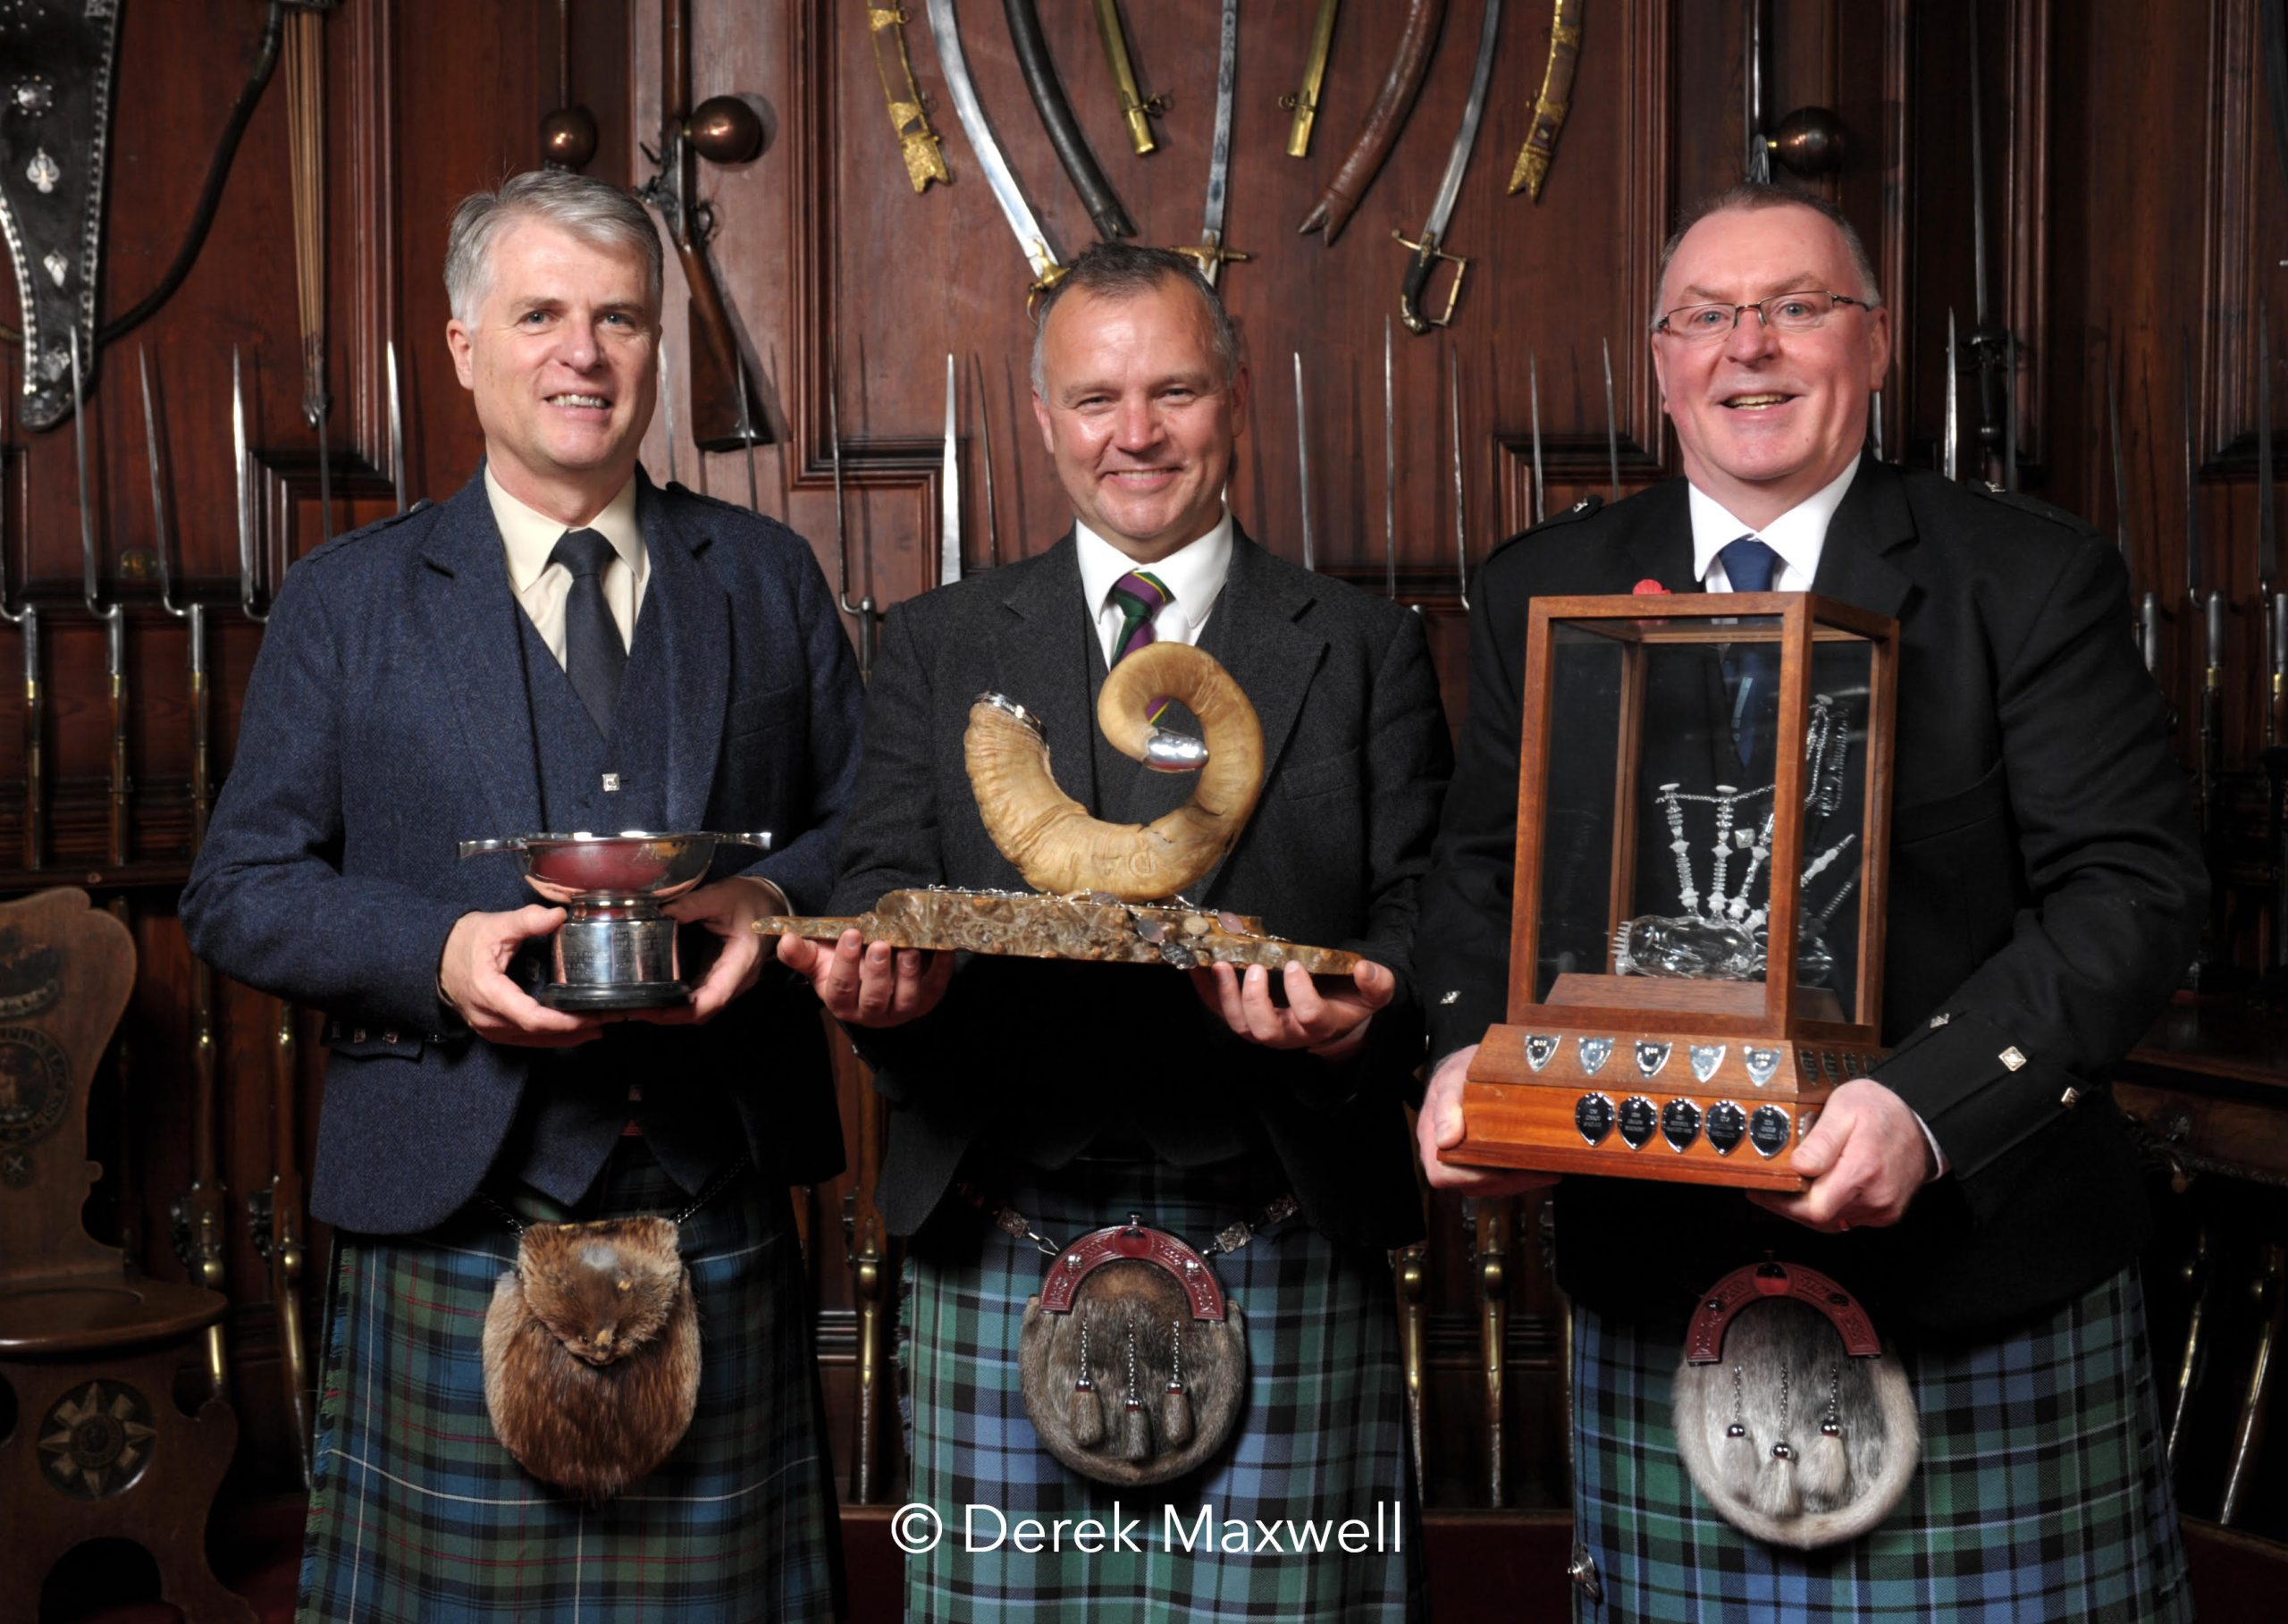 Jack Lee Stuart Liddell Willie McCallum - 2020 Glenfiddich Championship (credit Derek Maxwell)